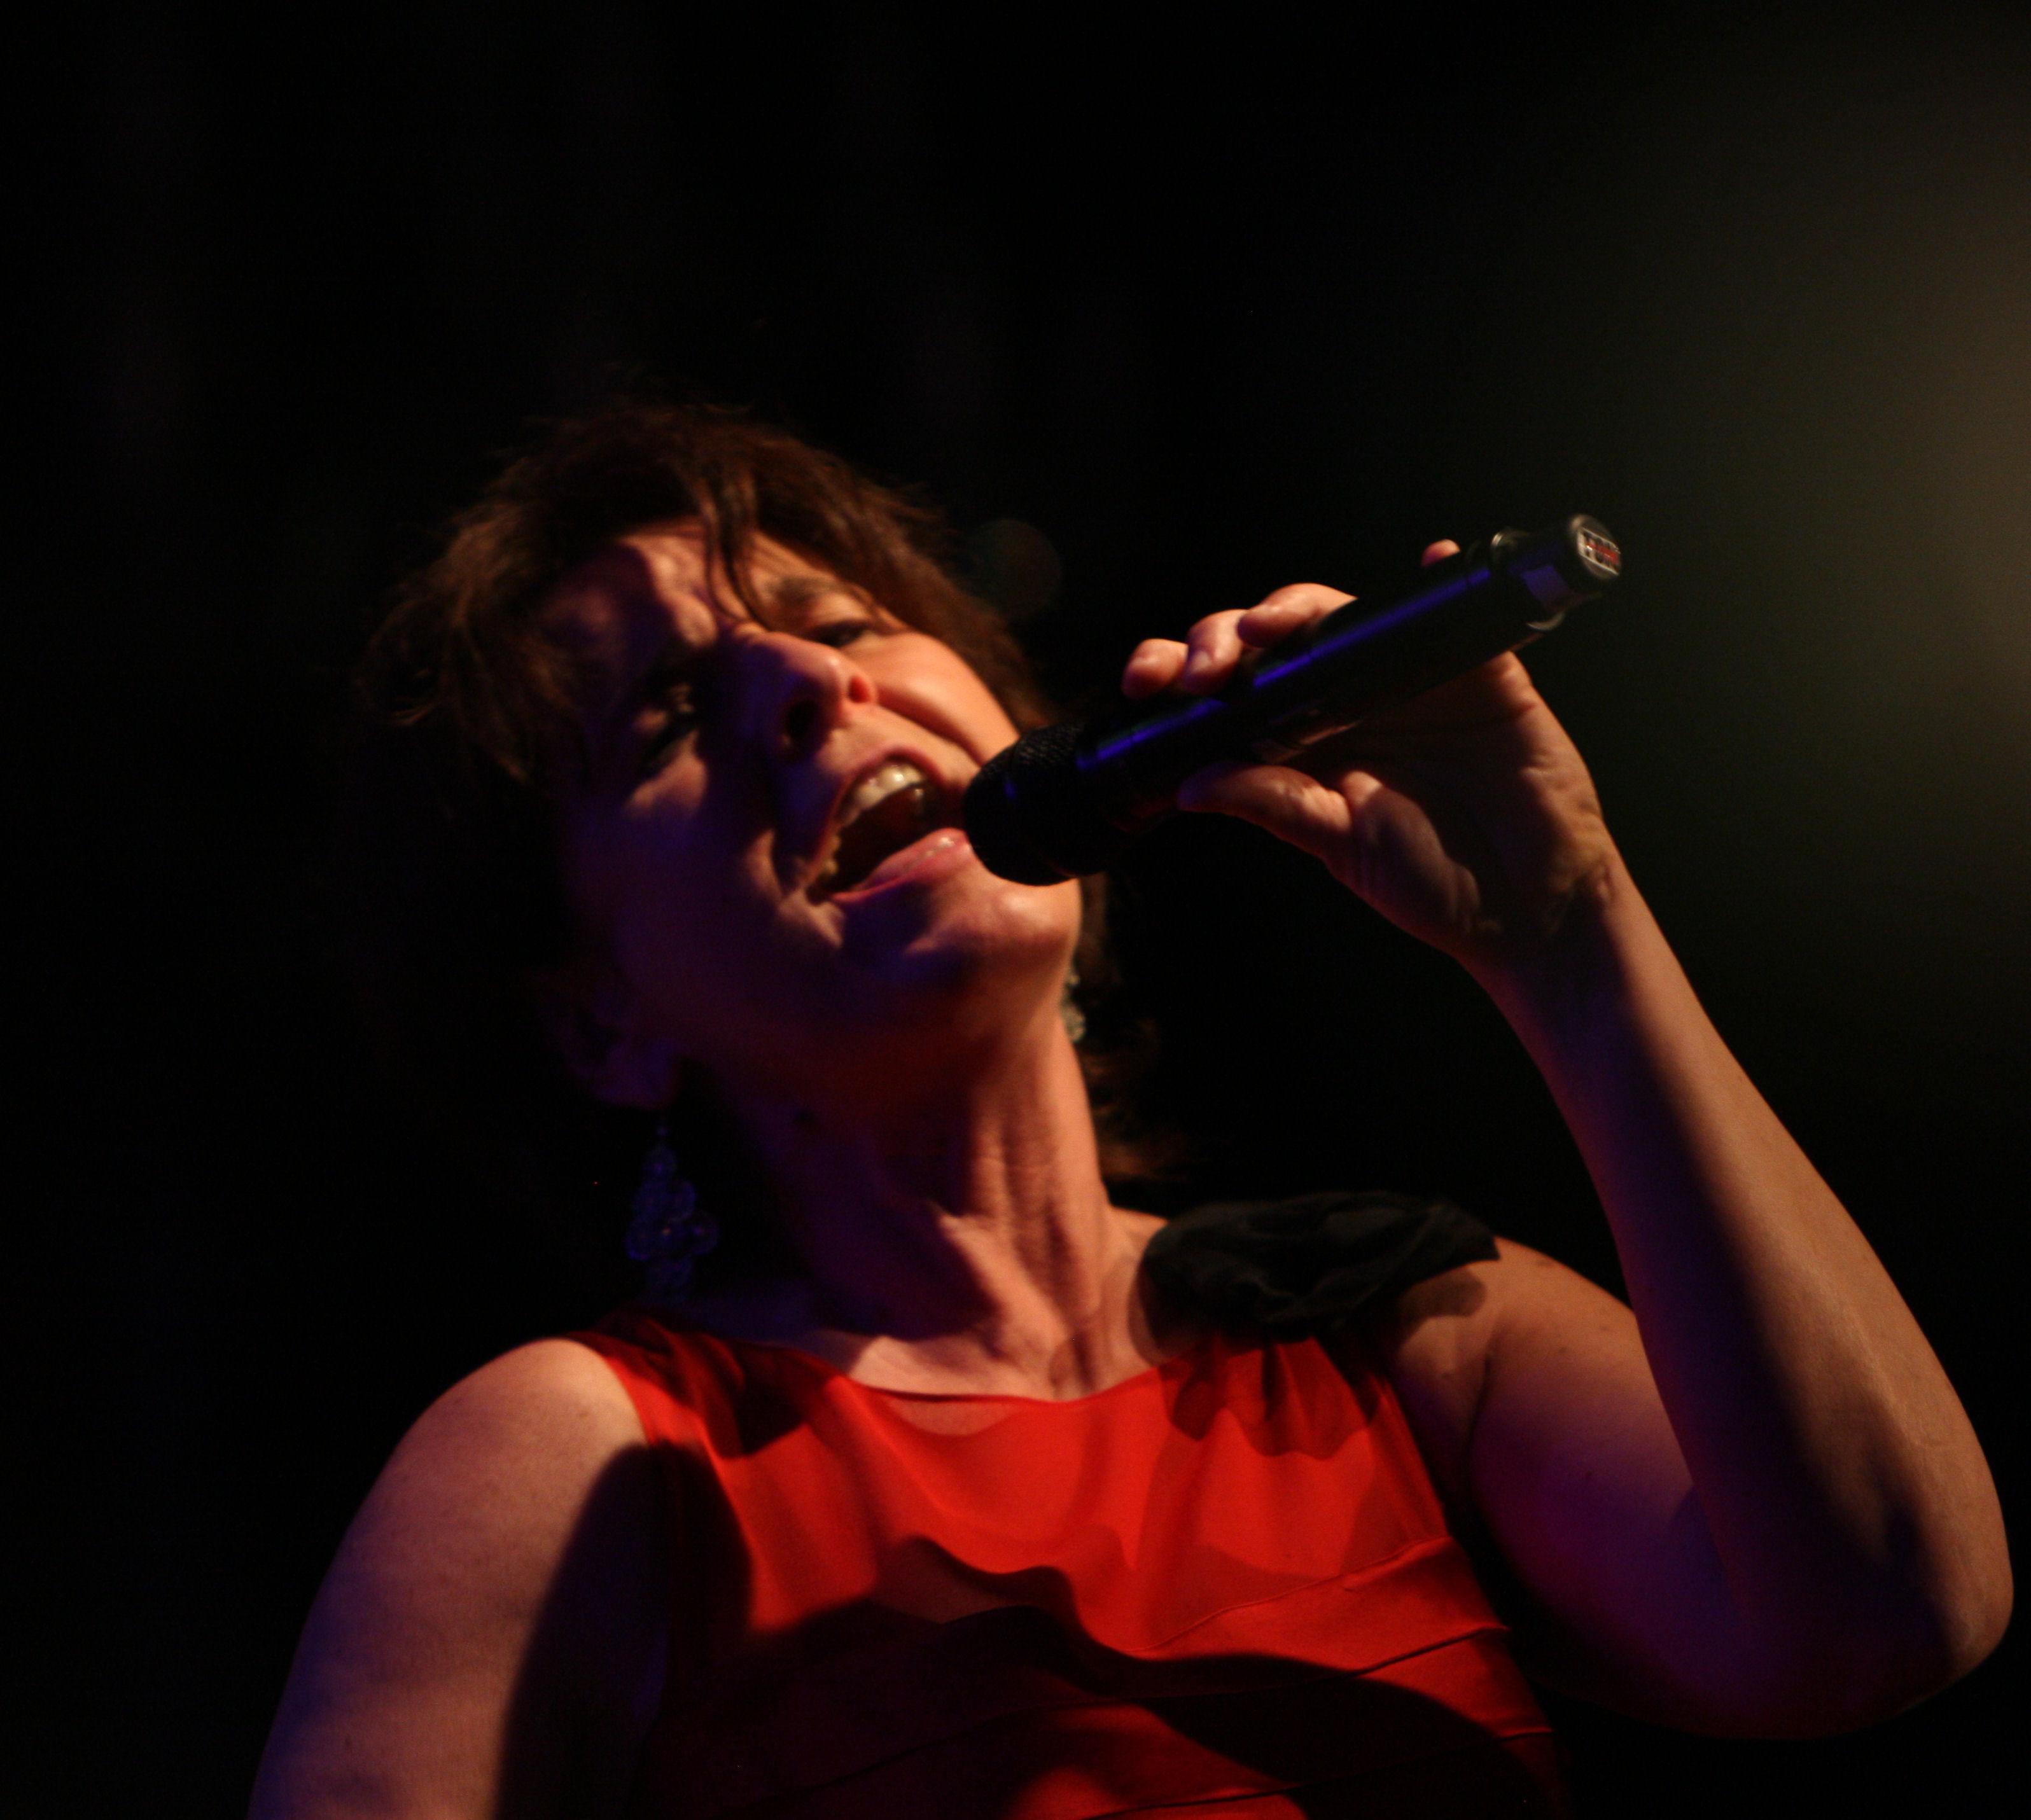 Monika Hintsches im Roten Krokodil